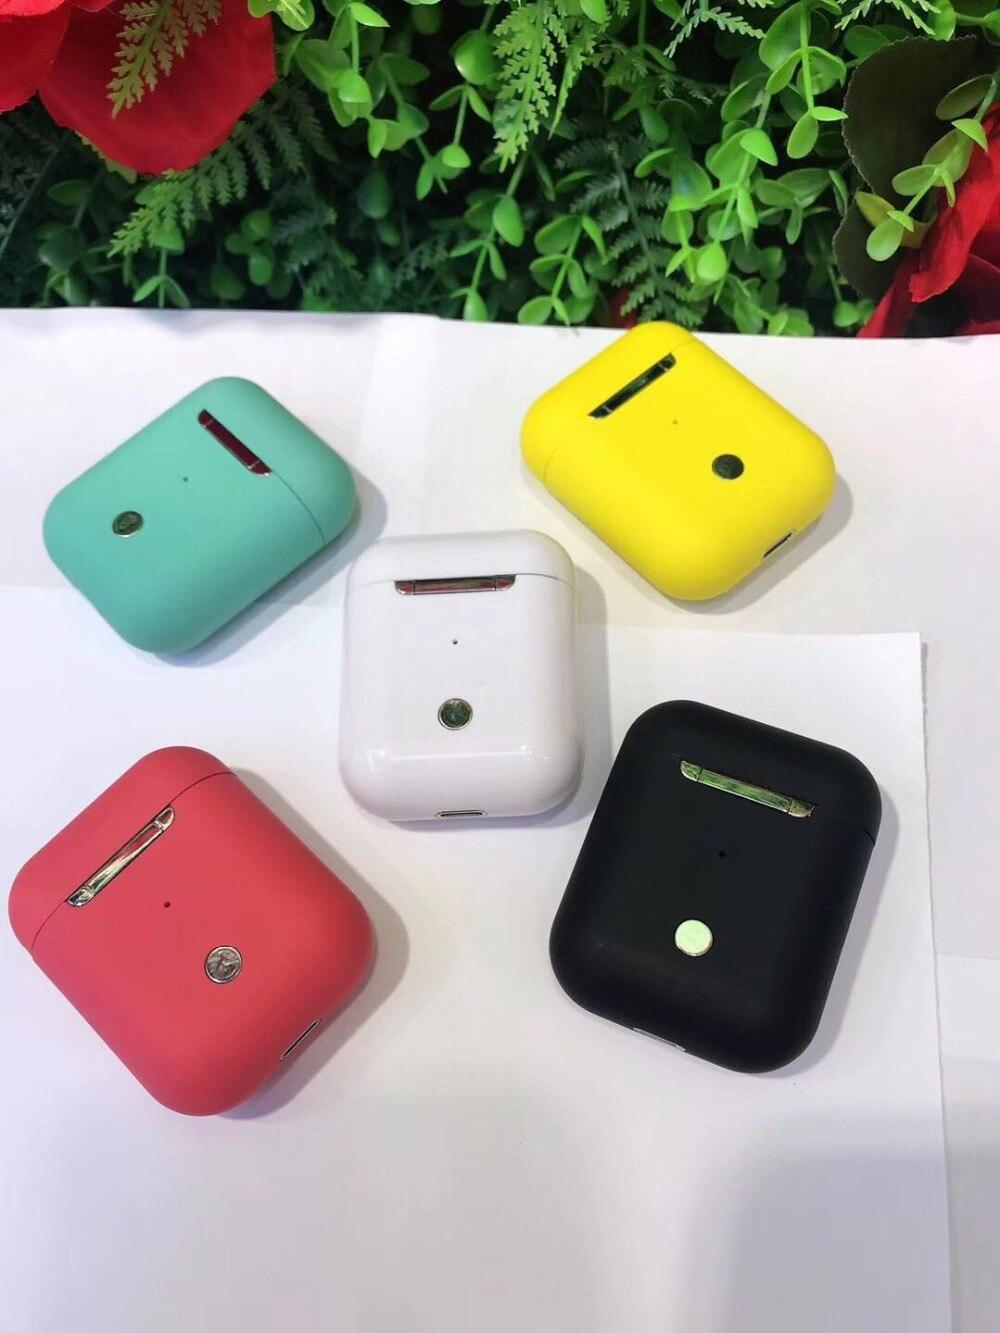 Colorful-TWS-I9s-TWS-earbuds-5-0-Bluetooth-earphones-Wireless-headset (2)